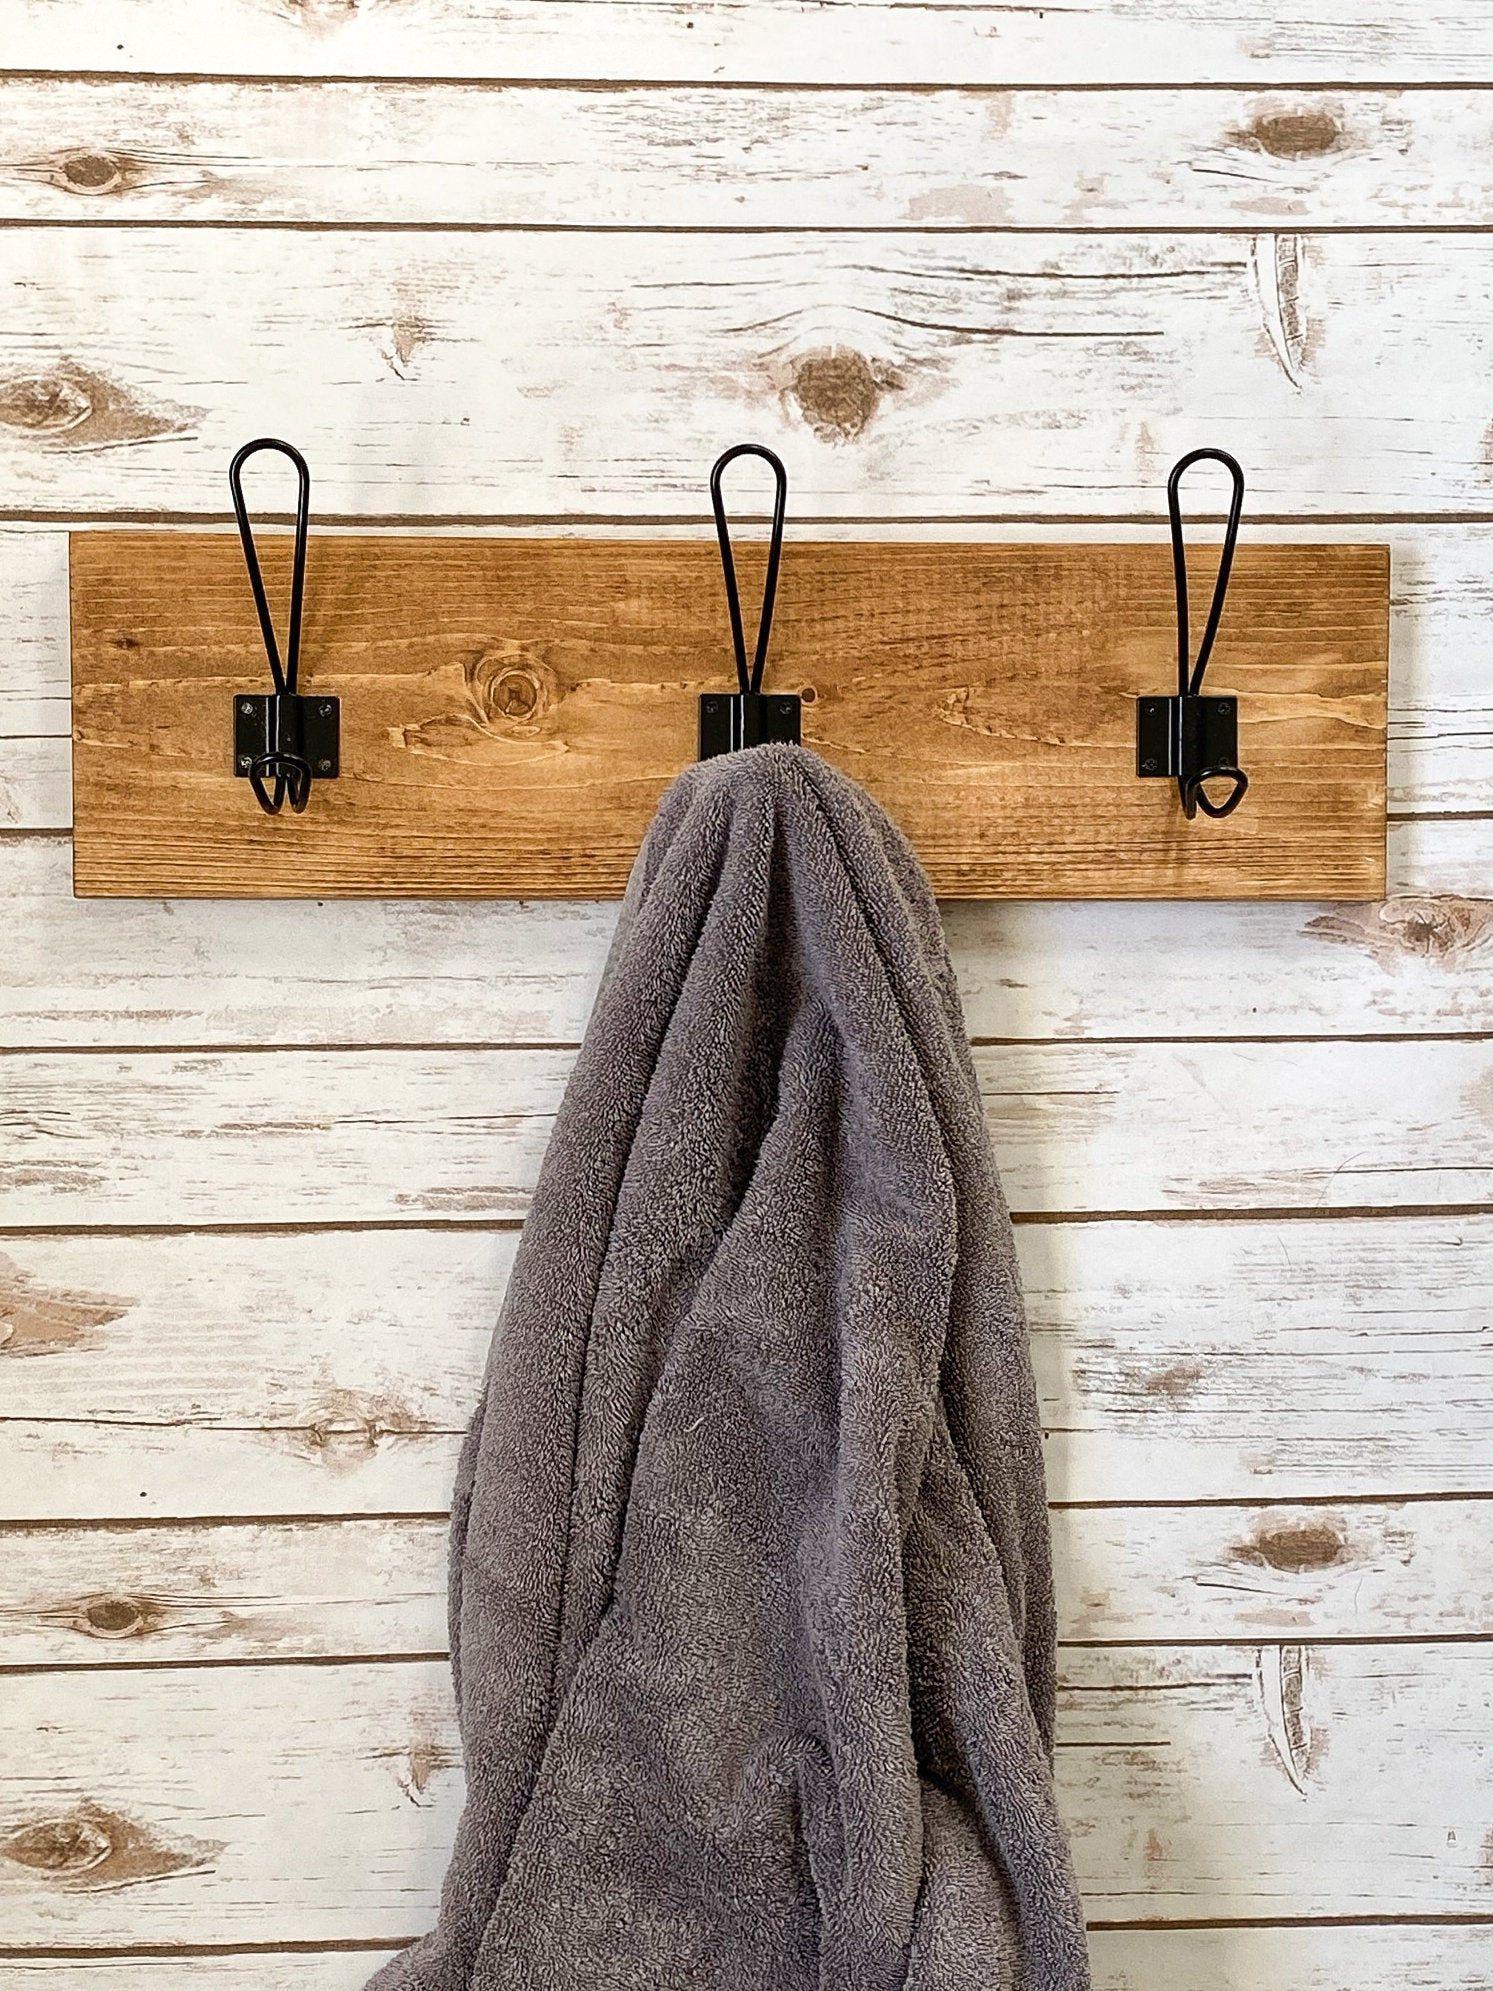 Farmhouse Towel Holder Entryway Hook Stocking Holder Towel Hooks Coat Rack Hook Rack Bathroom Towel Hoo Hooks For Towels Bathroom Door Hooks Hook Rack Bathroom